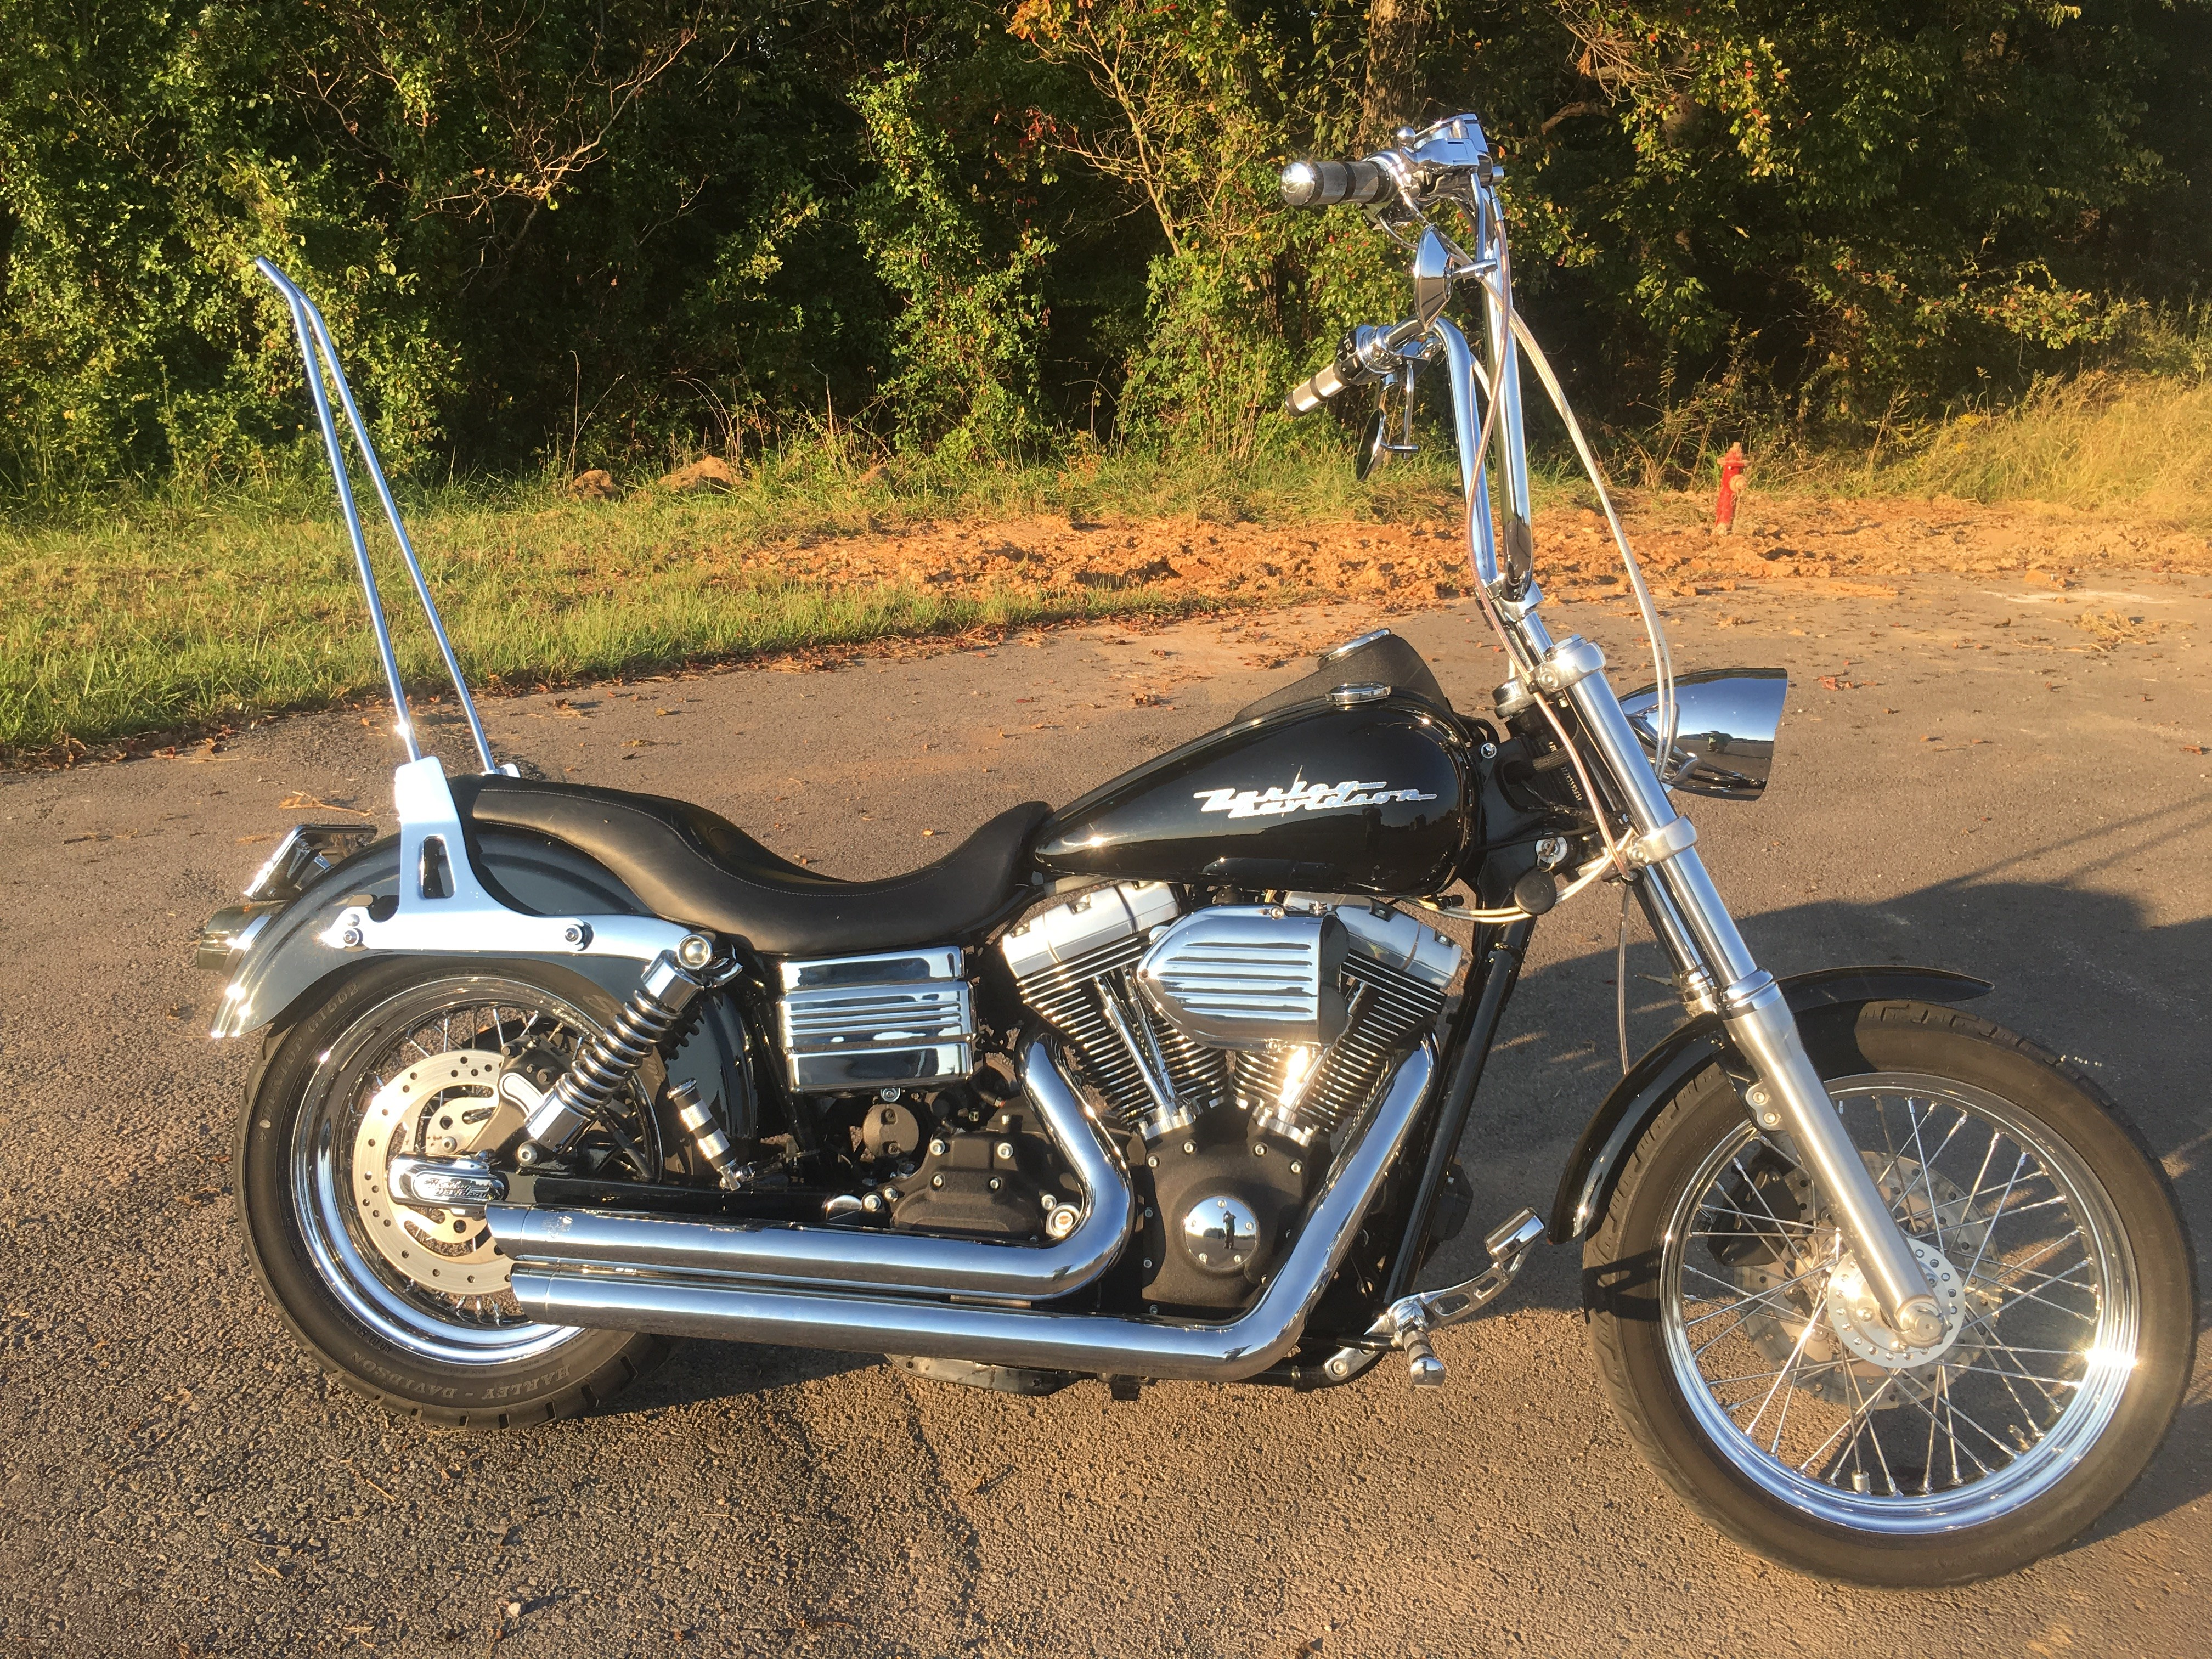 Used Harley Davidson Clarksville Tn